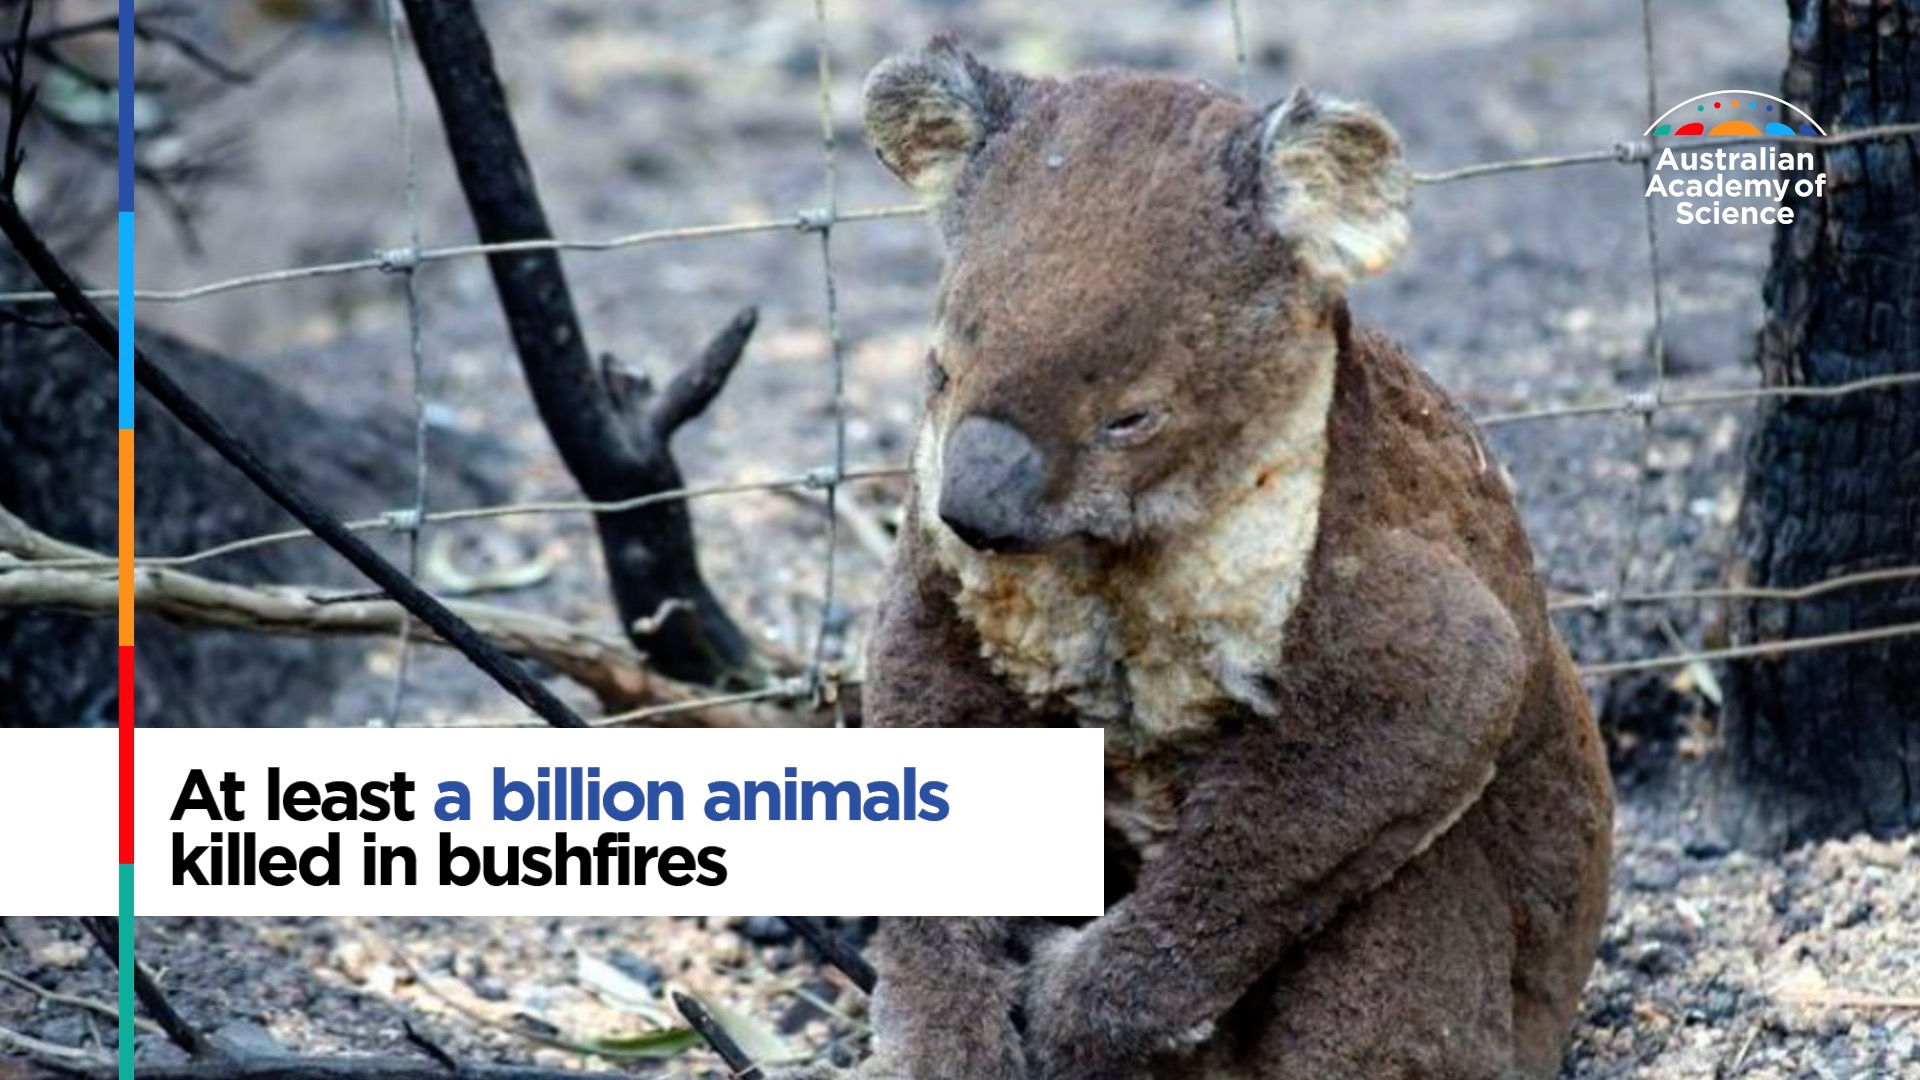 At least a billion animals killed in bushfires